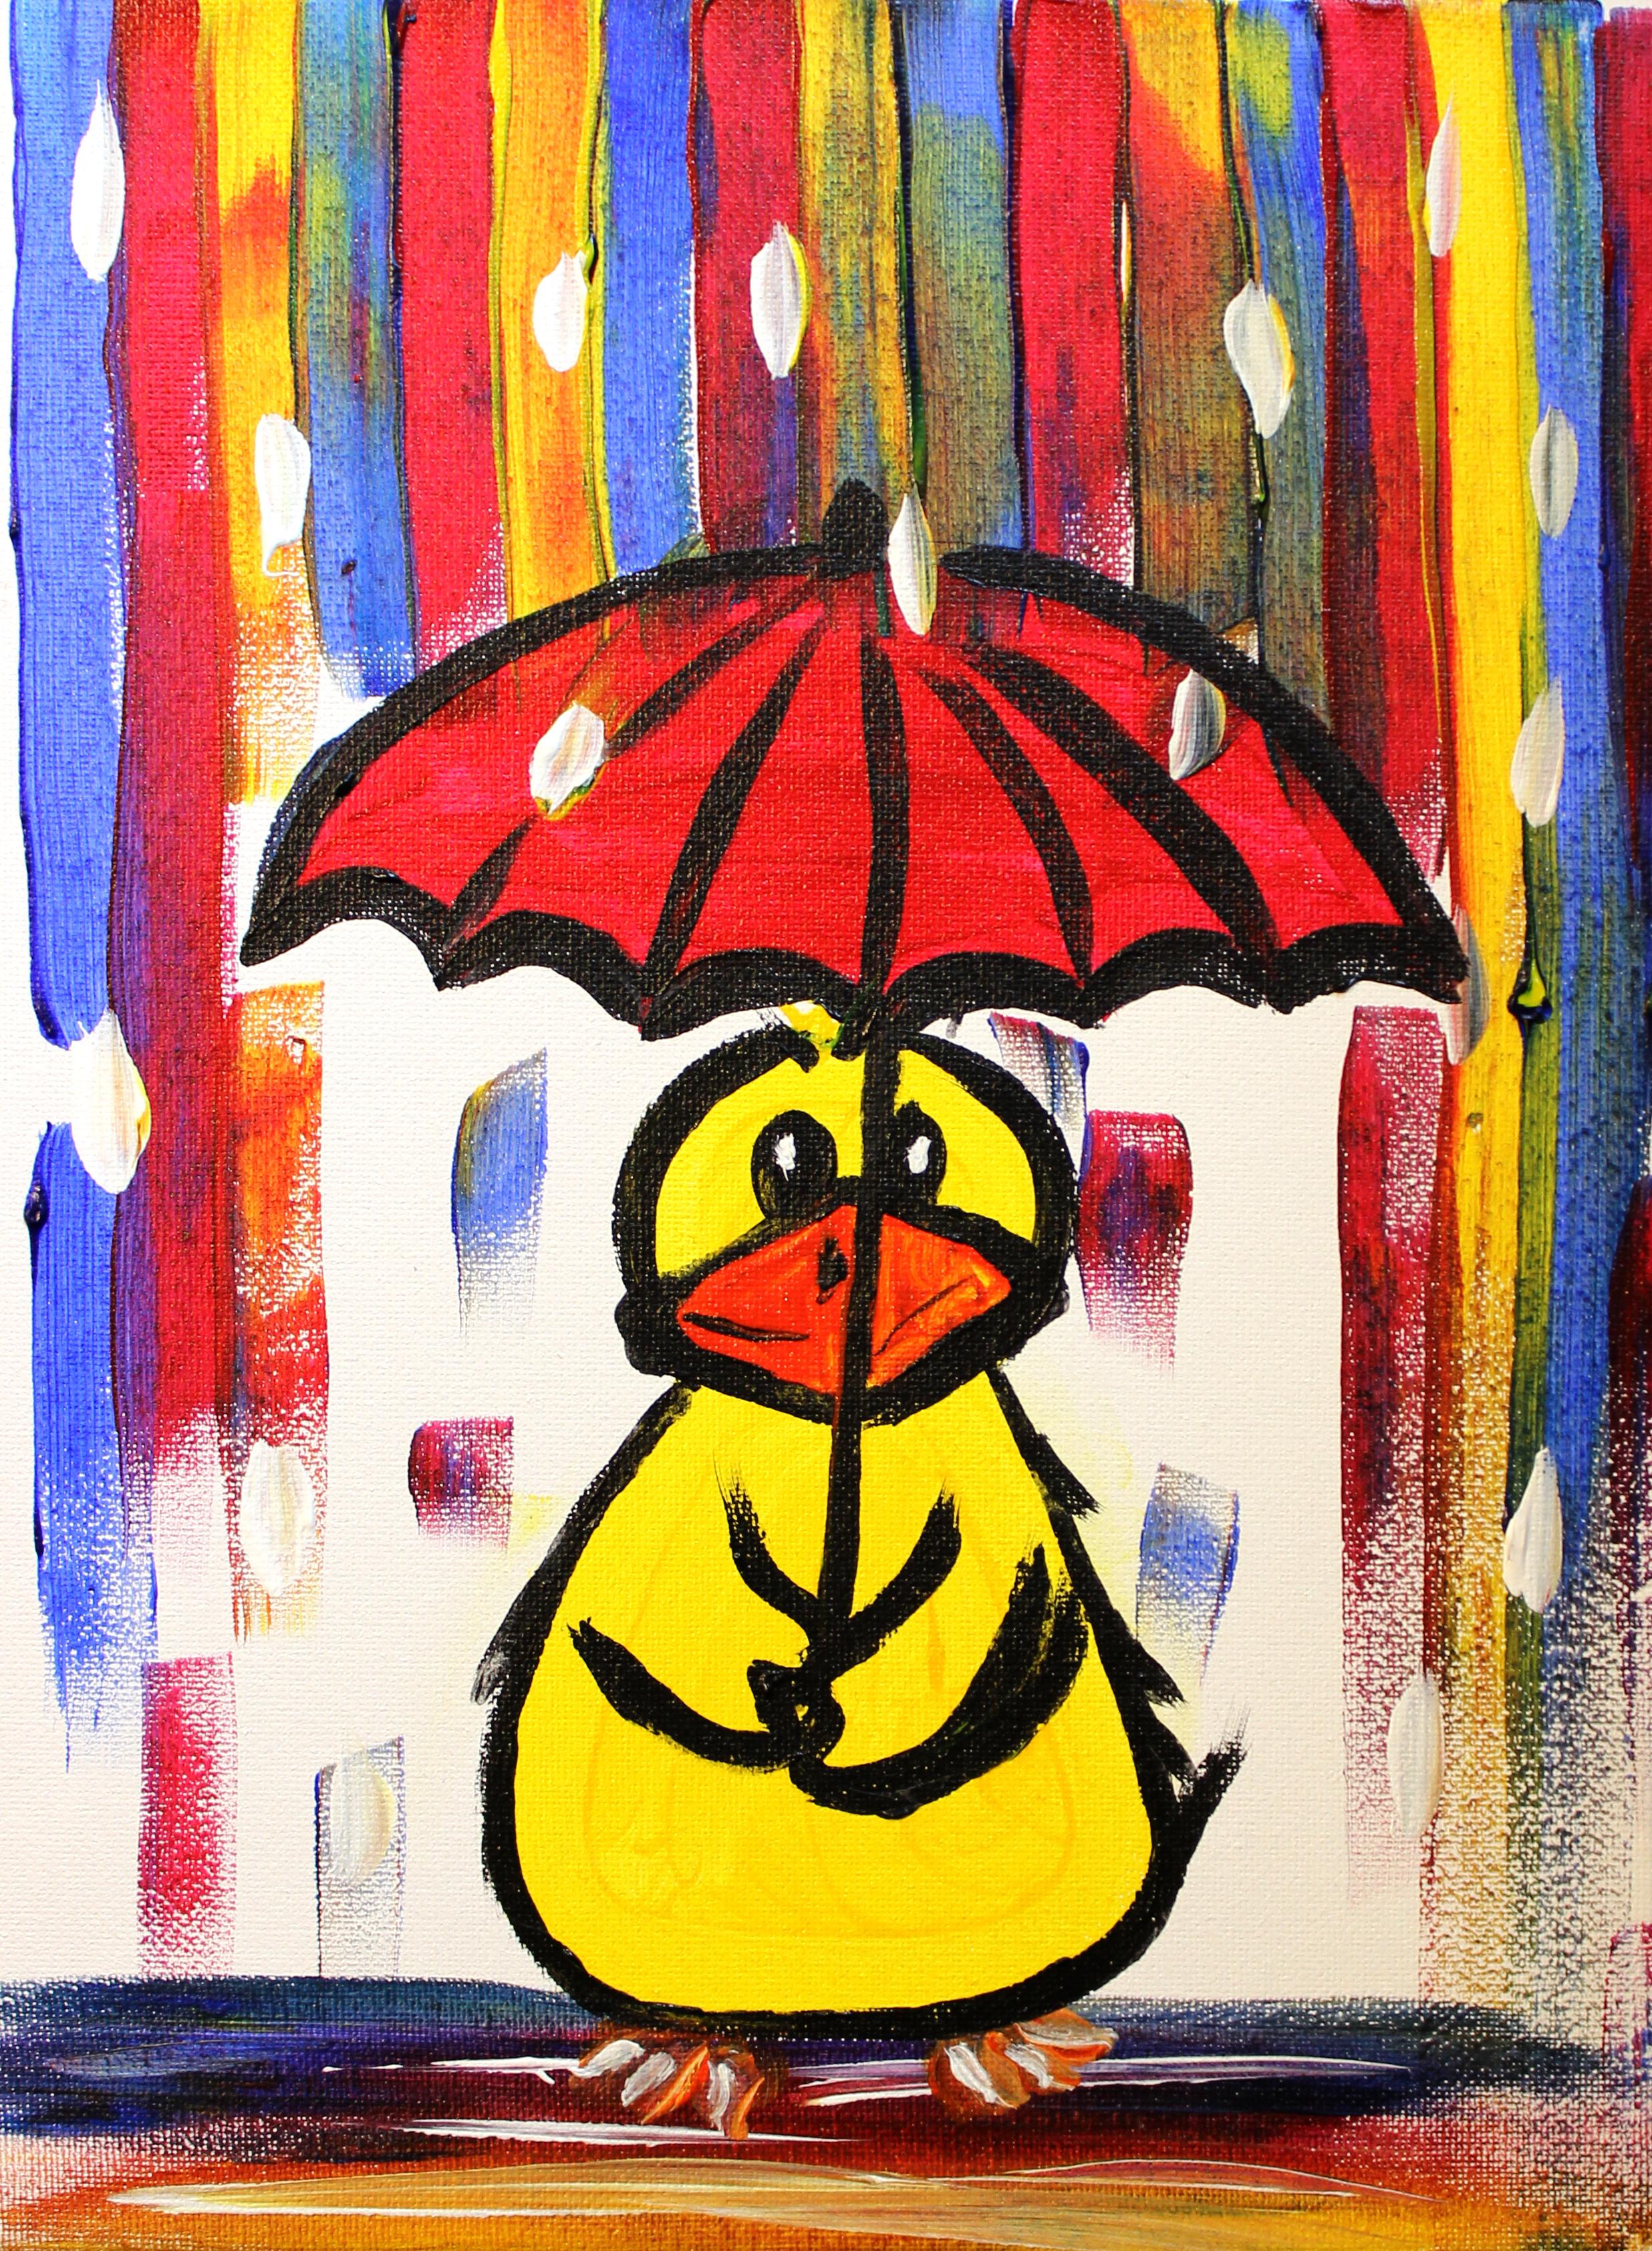 Duck Showers